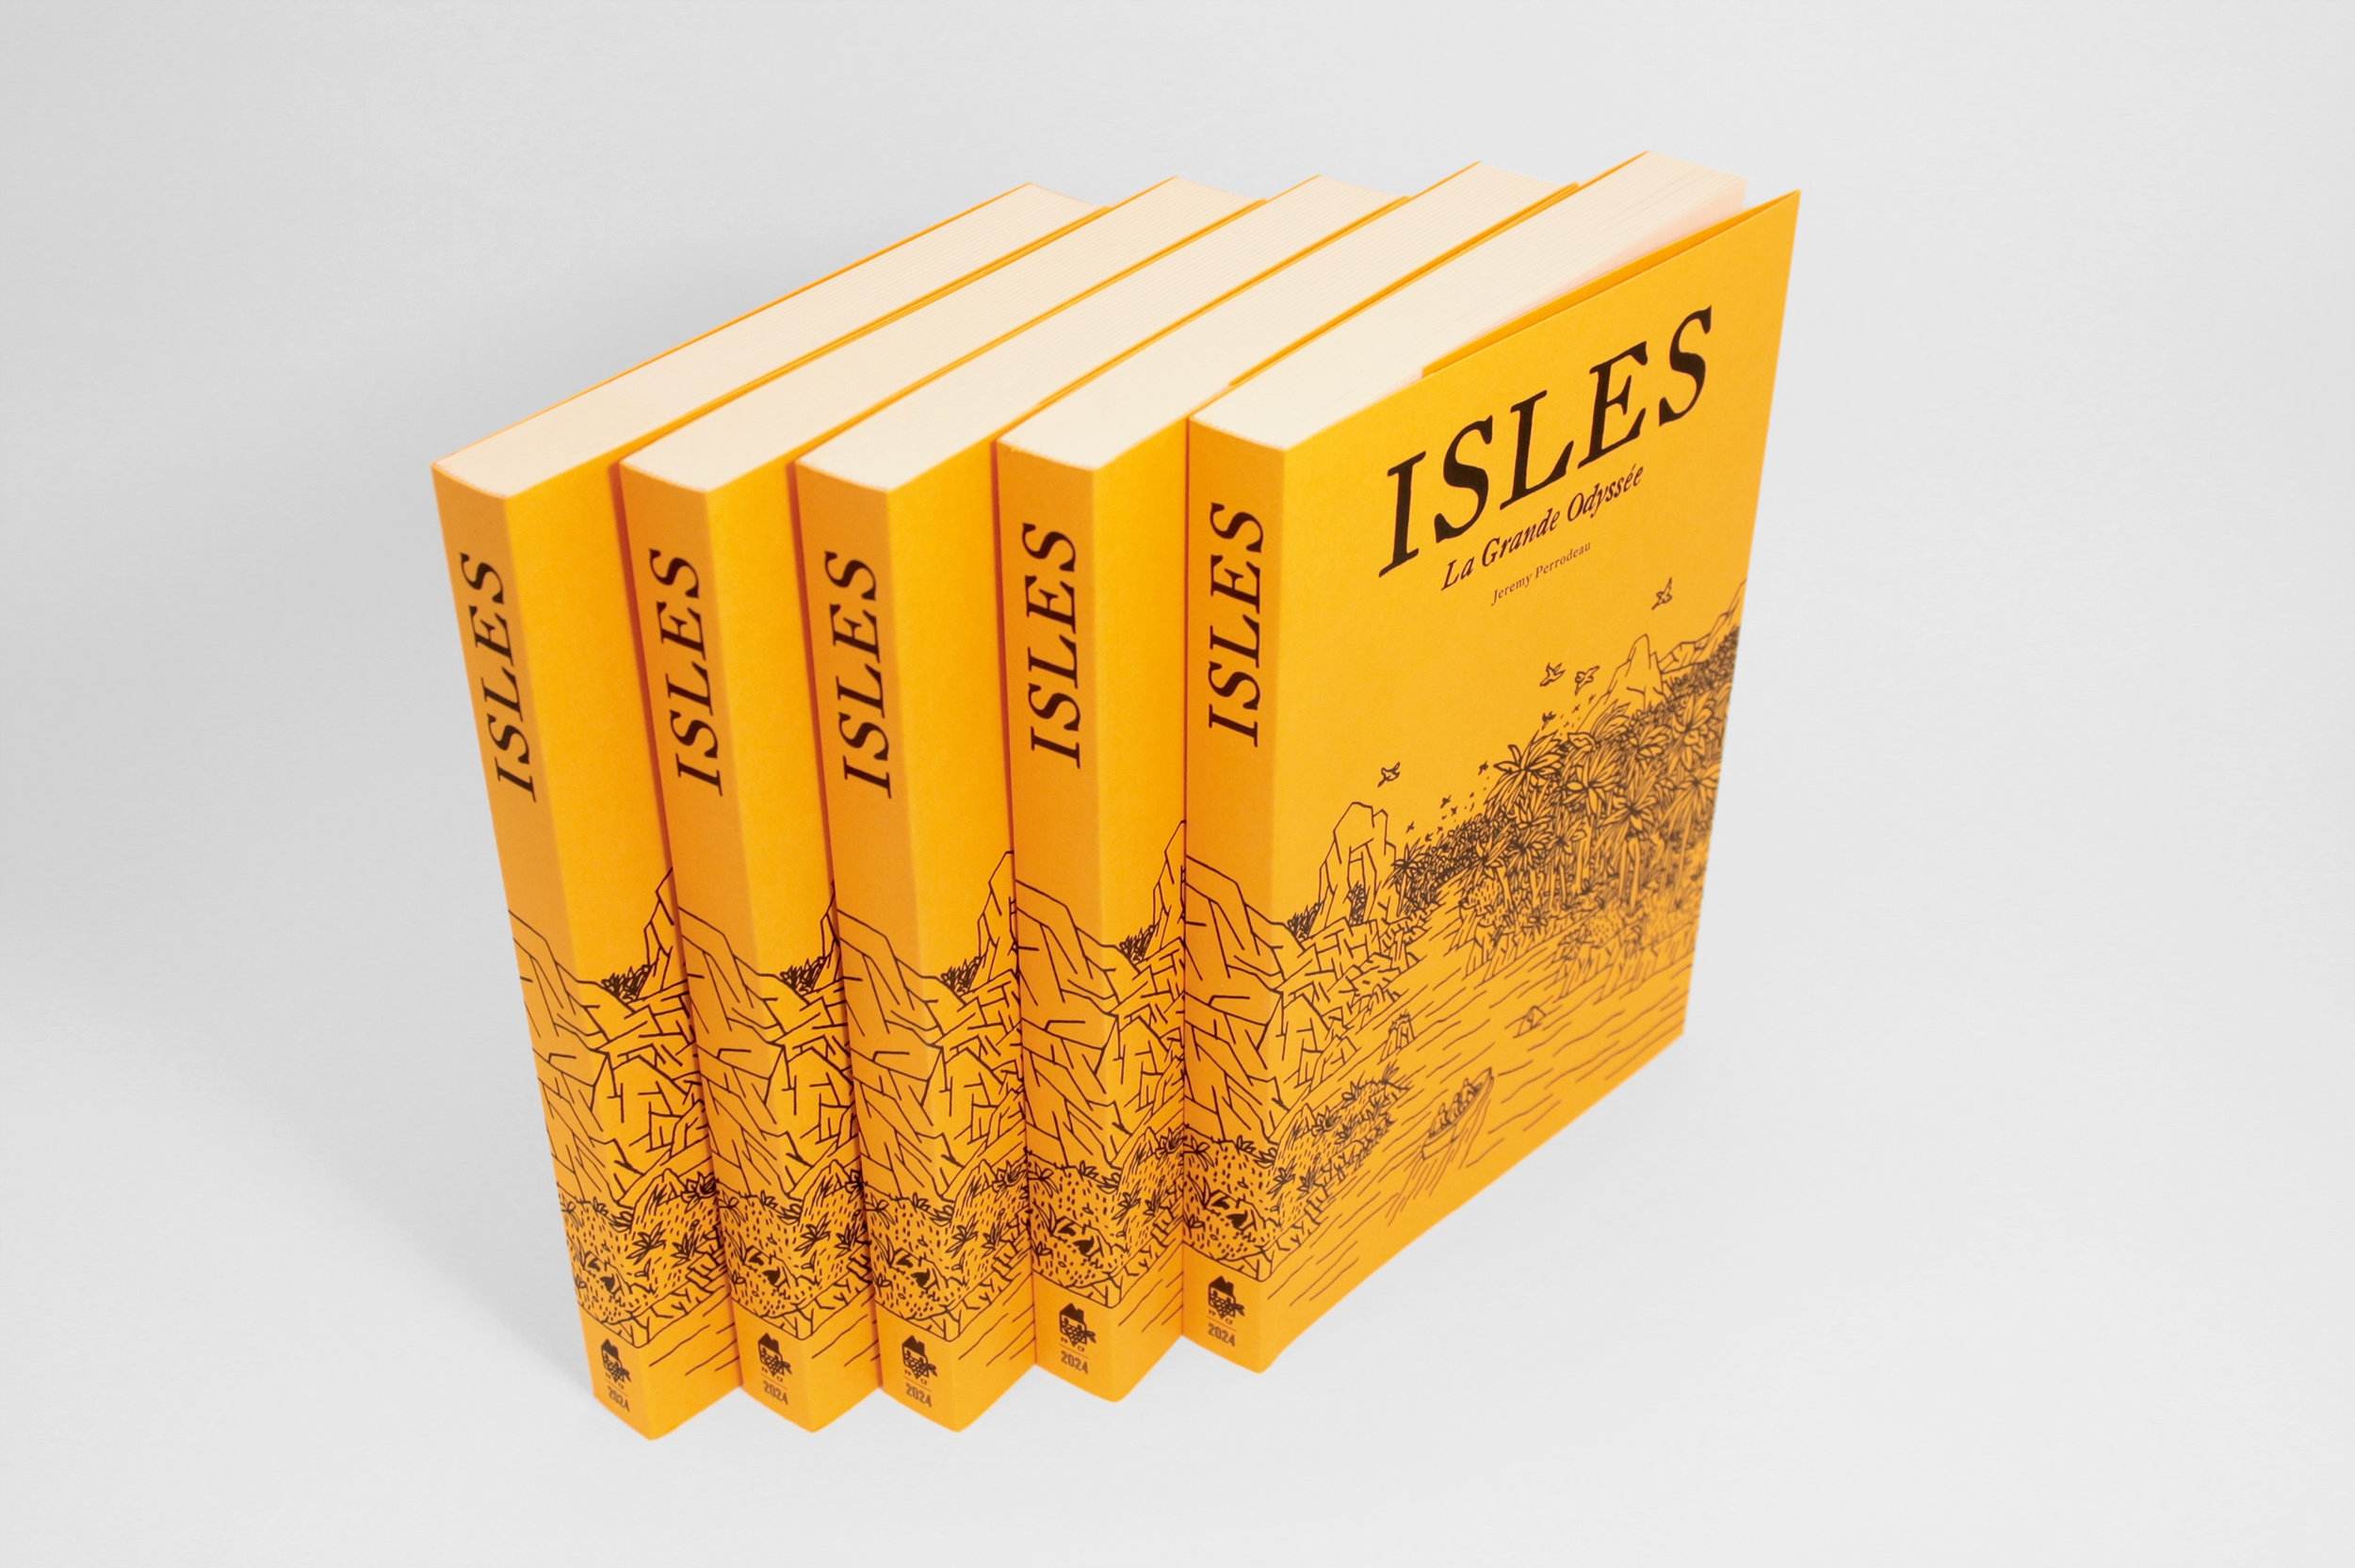 ISLES_photo_002.jpg